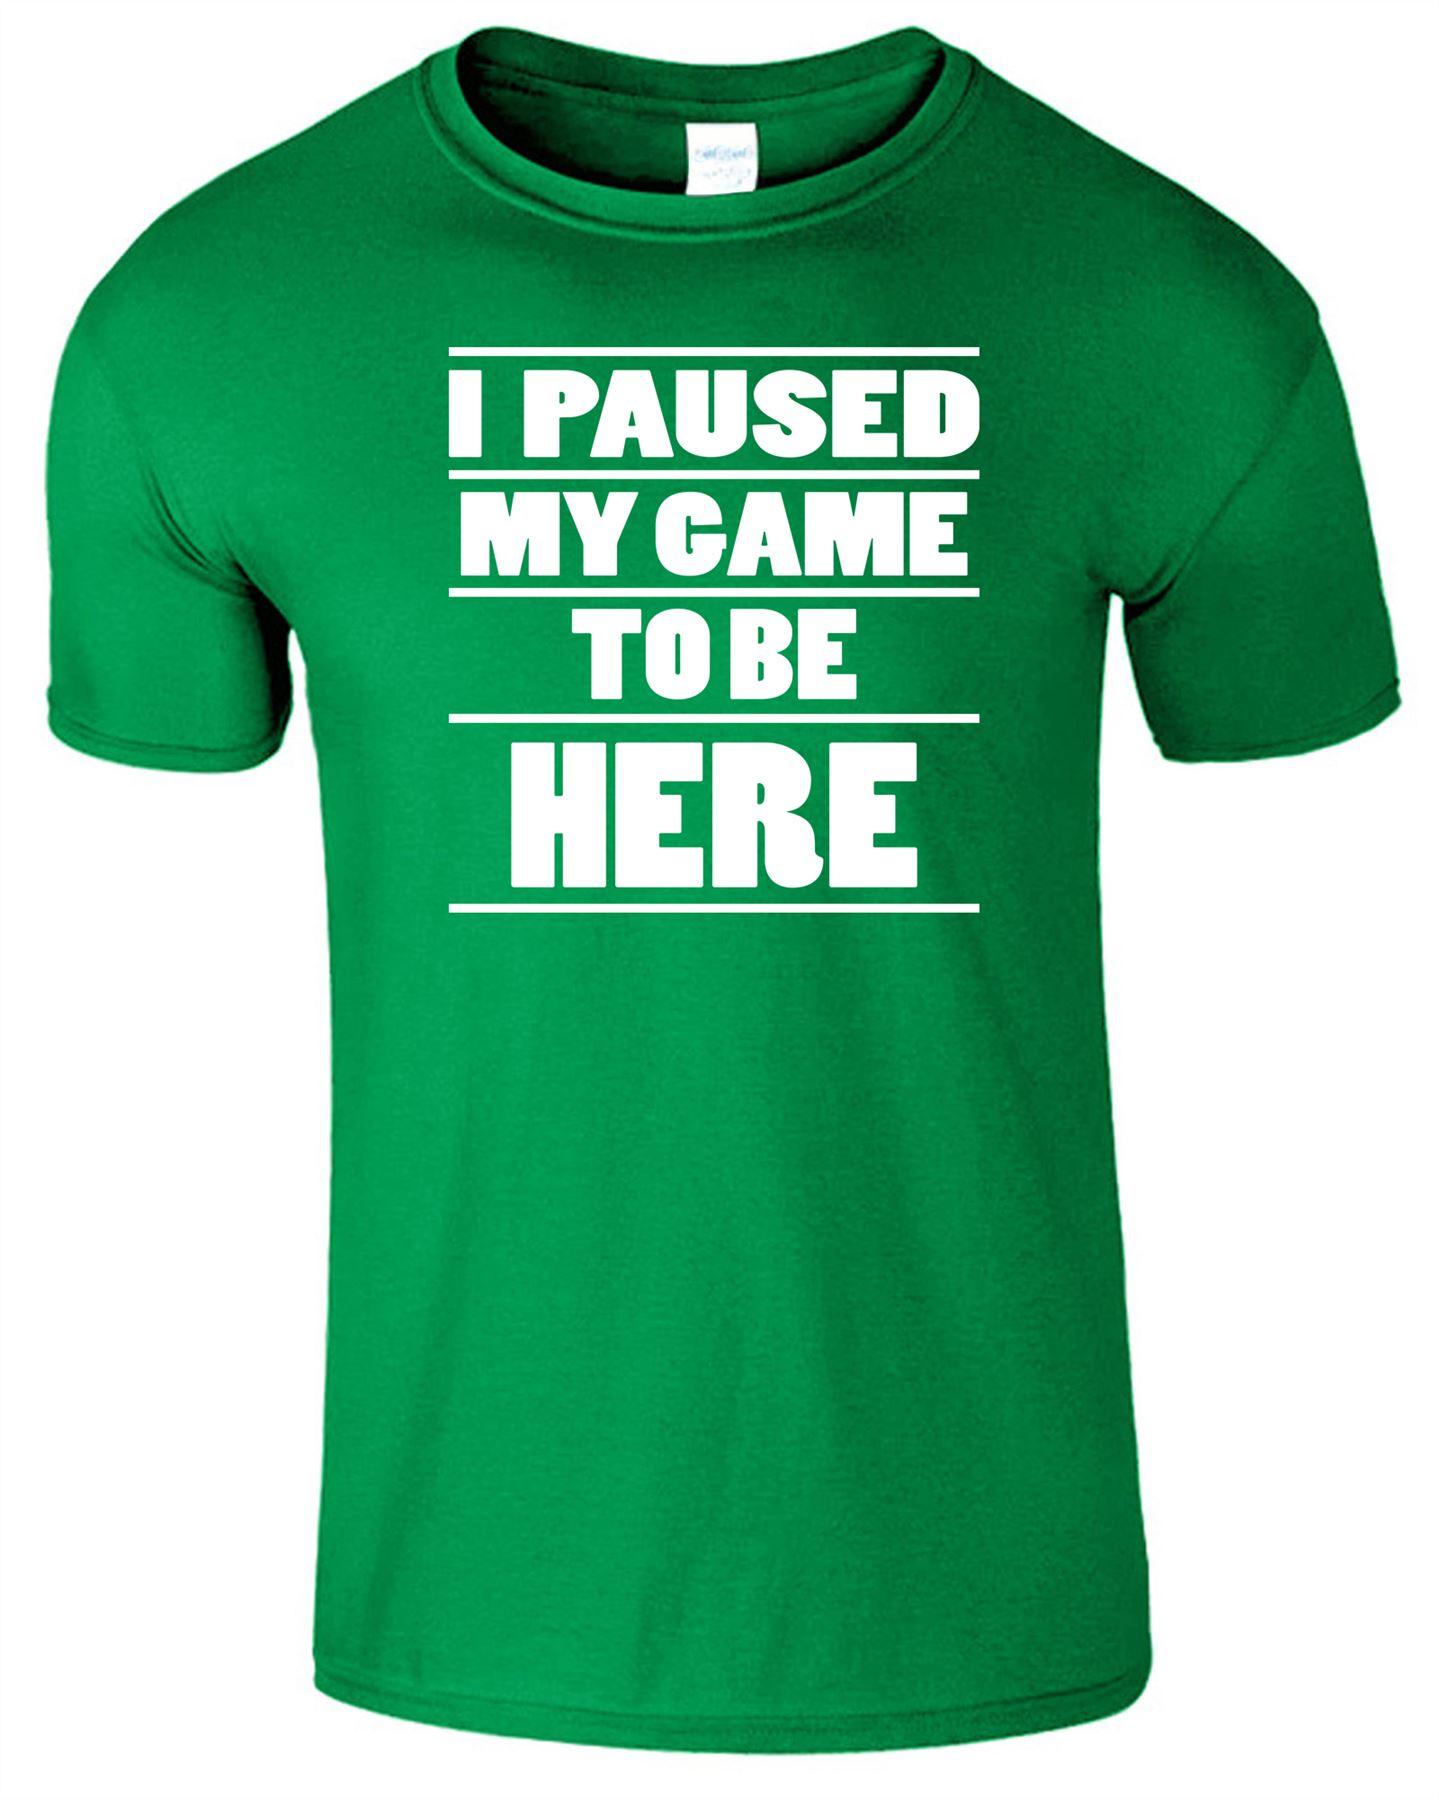 I miei in pausa gioco di essere qui Kids T-shirt Gaming Xmas Natale Ragazzi Ragazze Tee